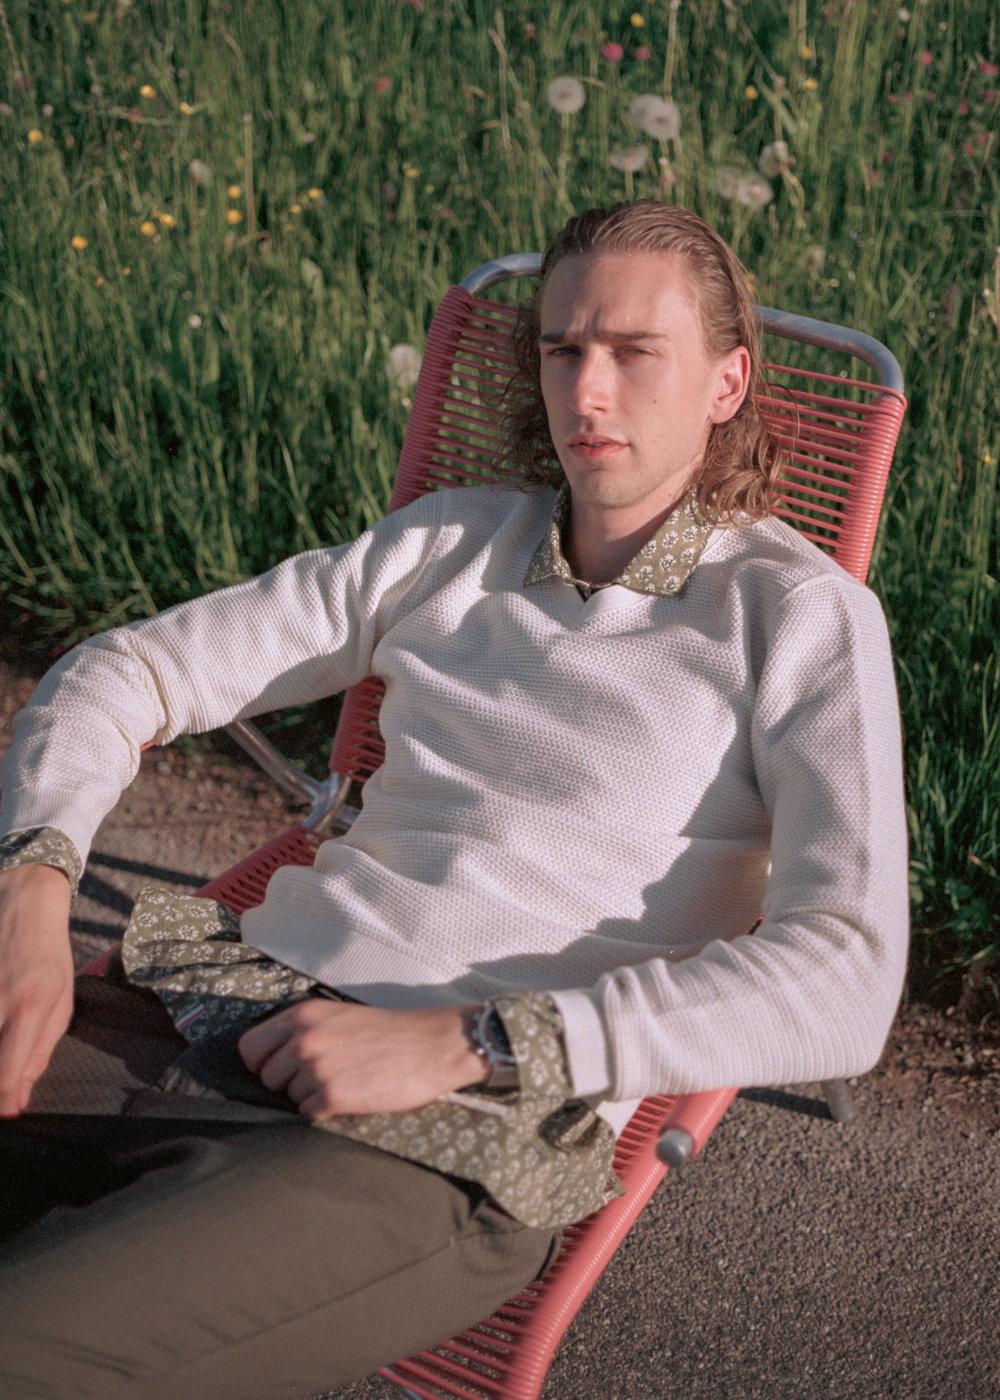 Fidelio sweater, Tintoria Mattei shirt, Myths trousers